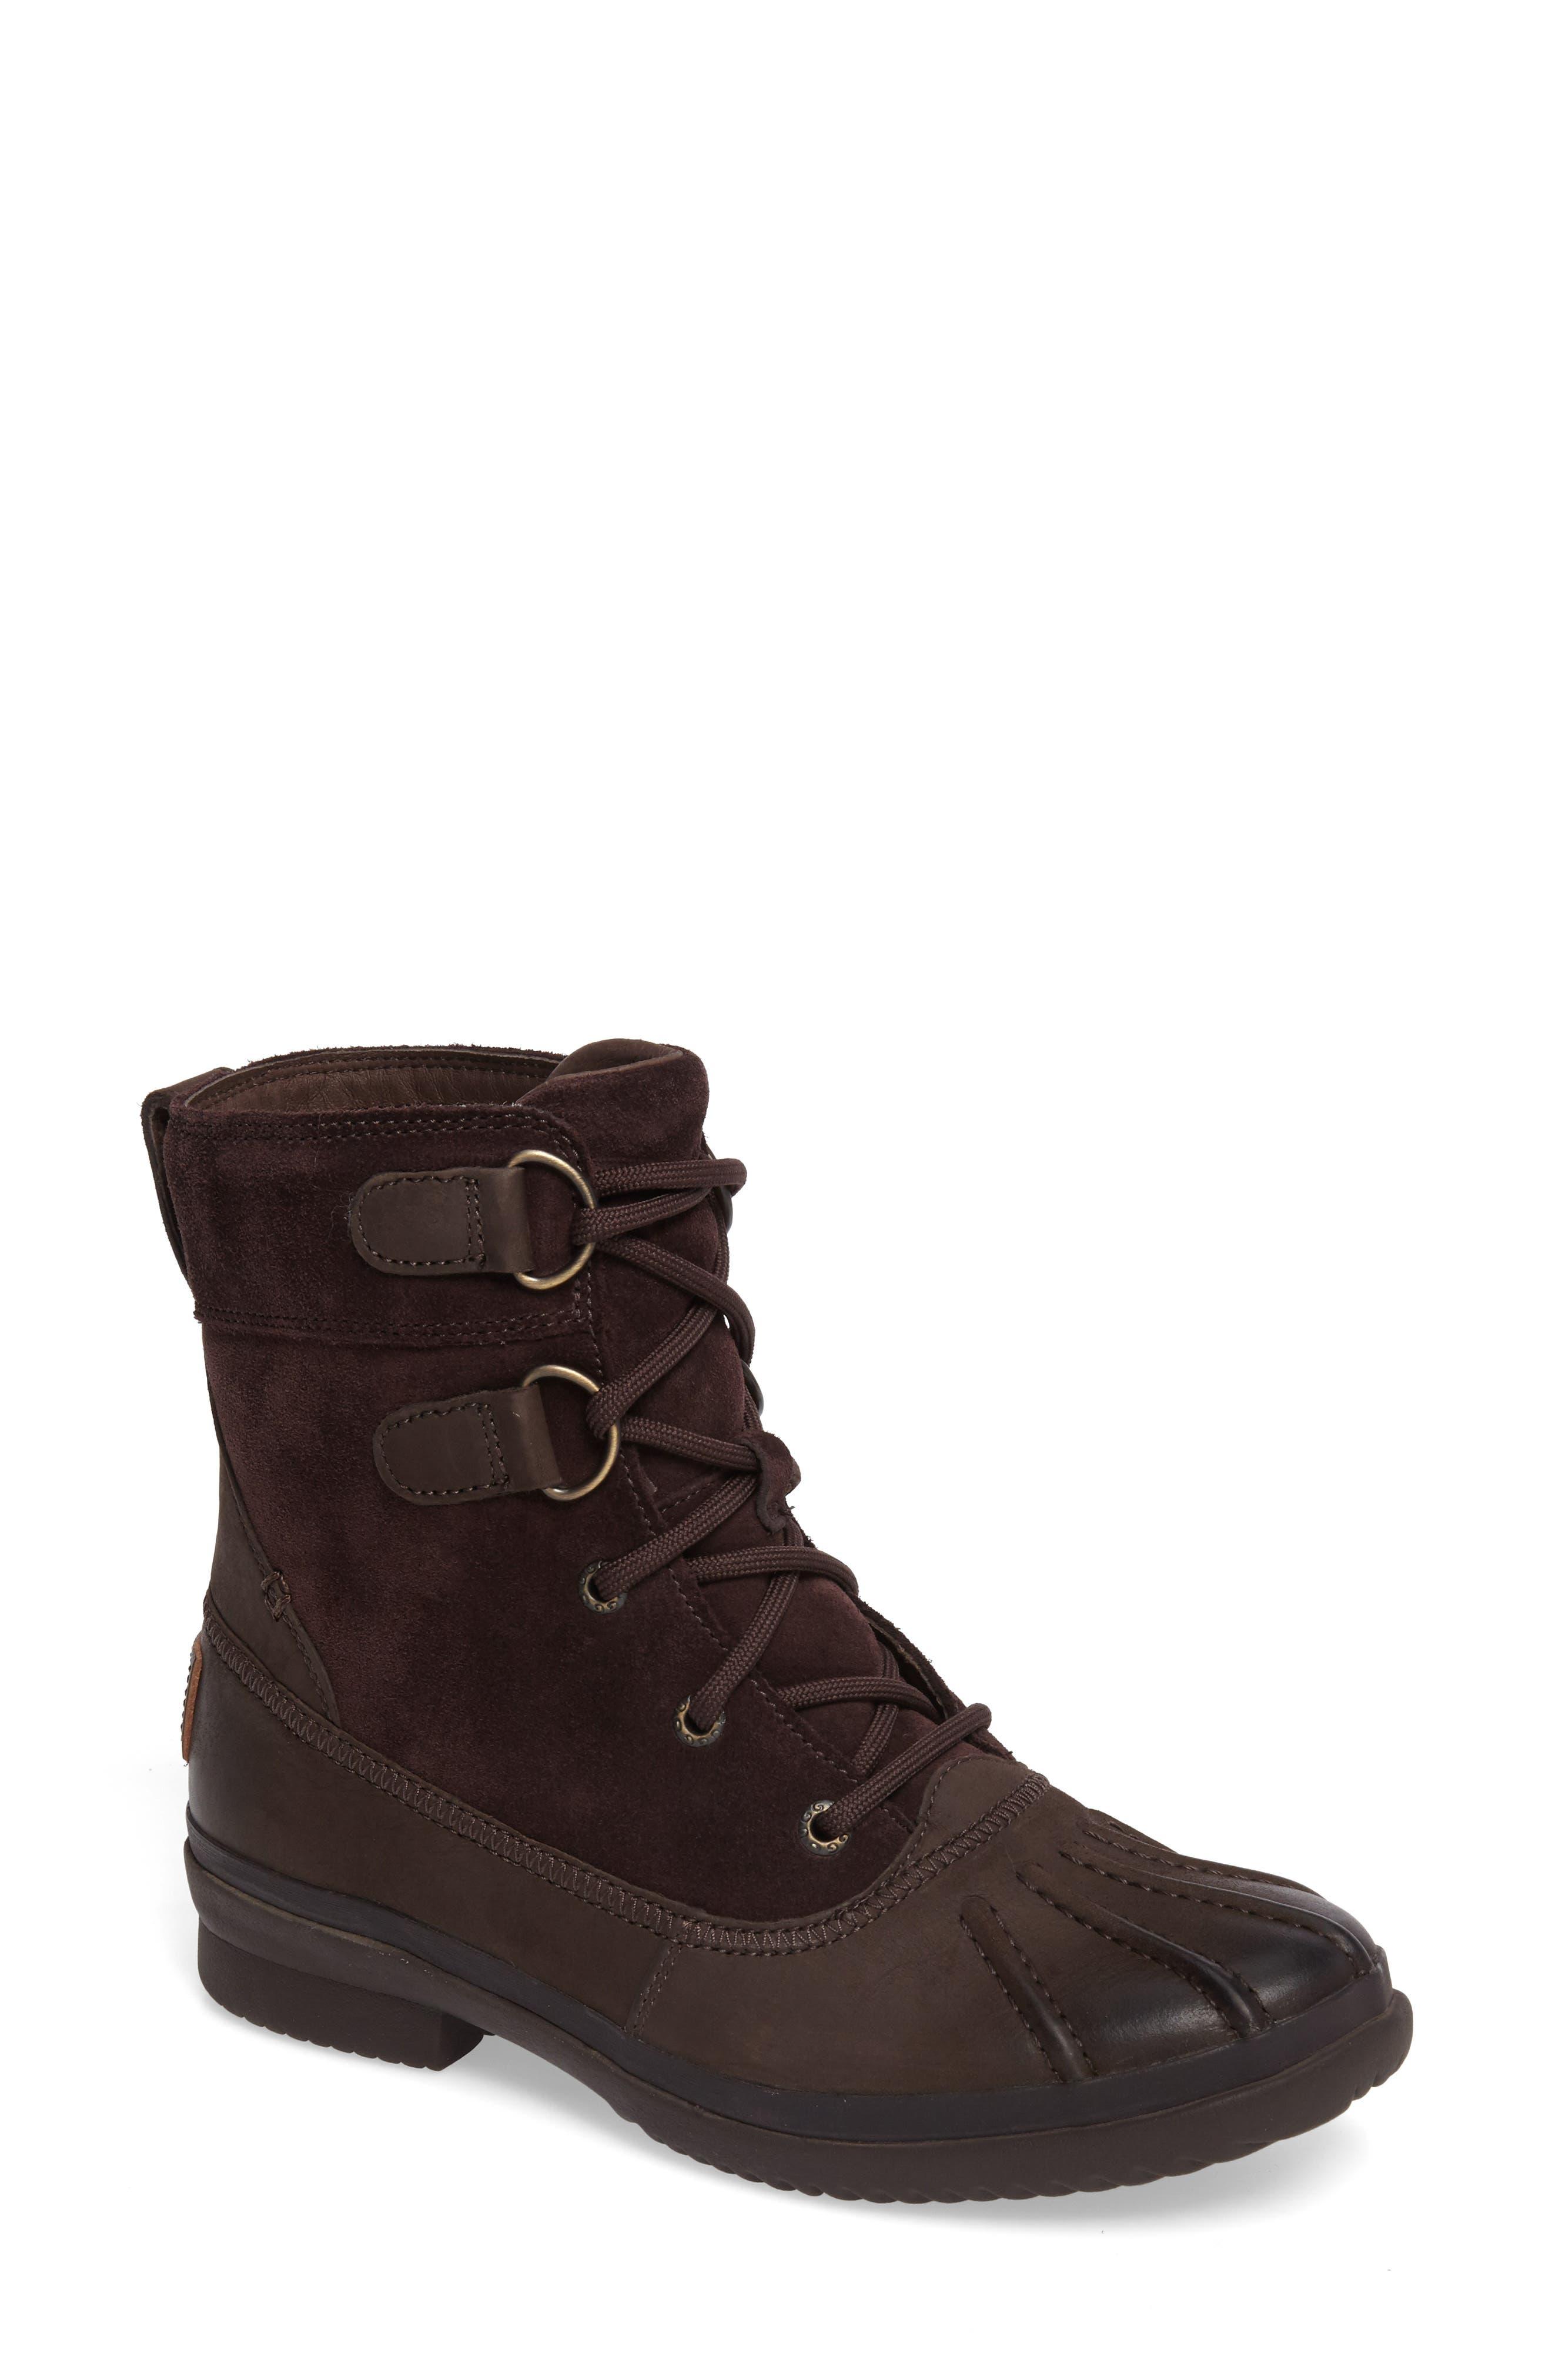 Main Image - UGG® Azaria Waterproof Boot (Women)